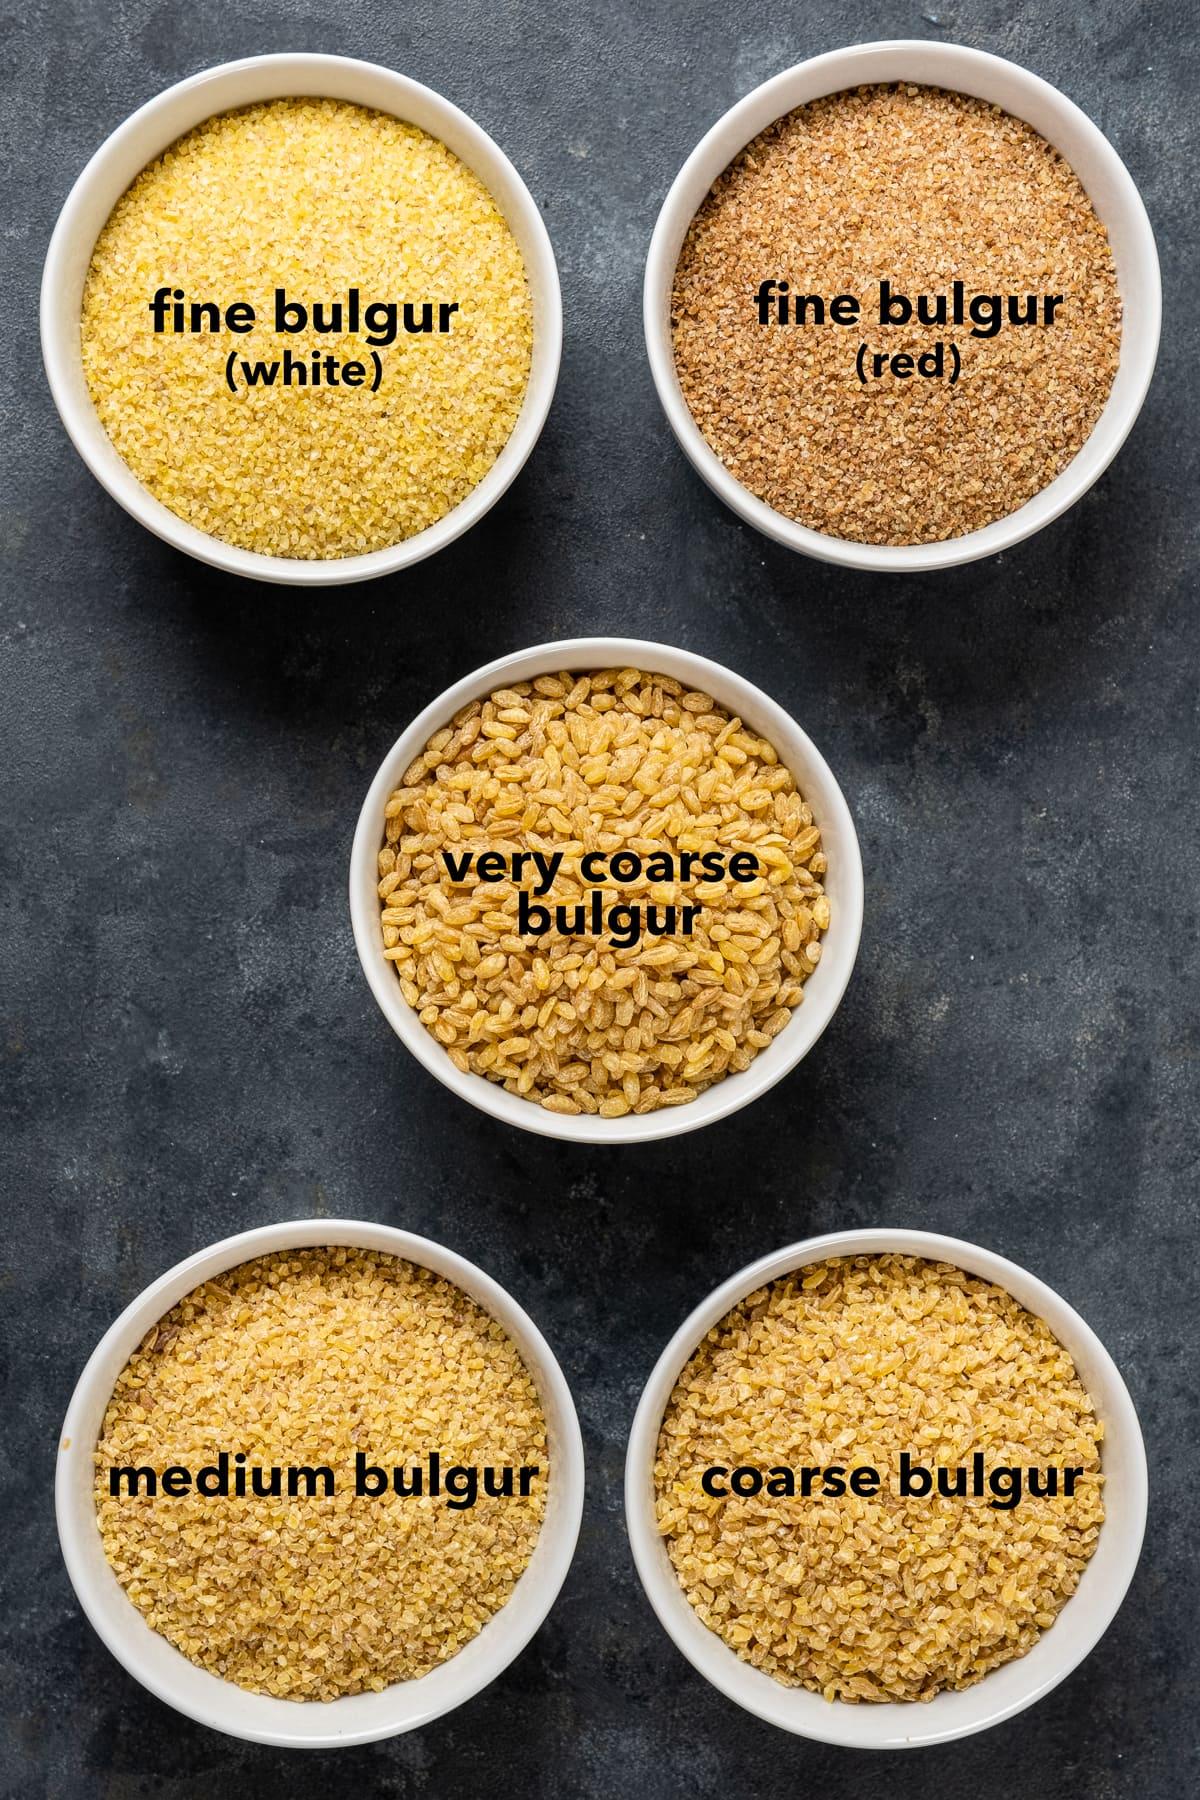 White fine bulgur, red fine bulgur, medium bulgur, coarse bulgur and very coarse bulgur in small bowls on a dark background.